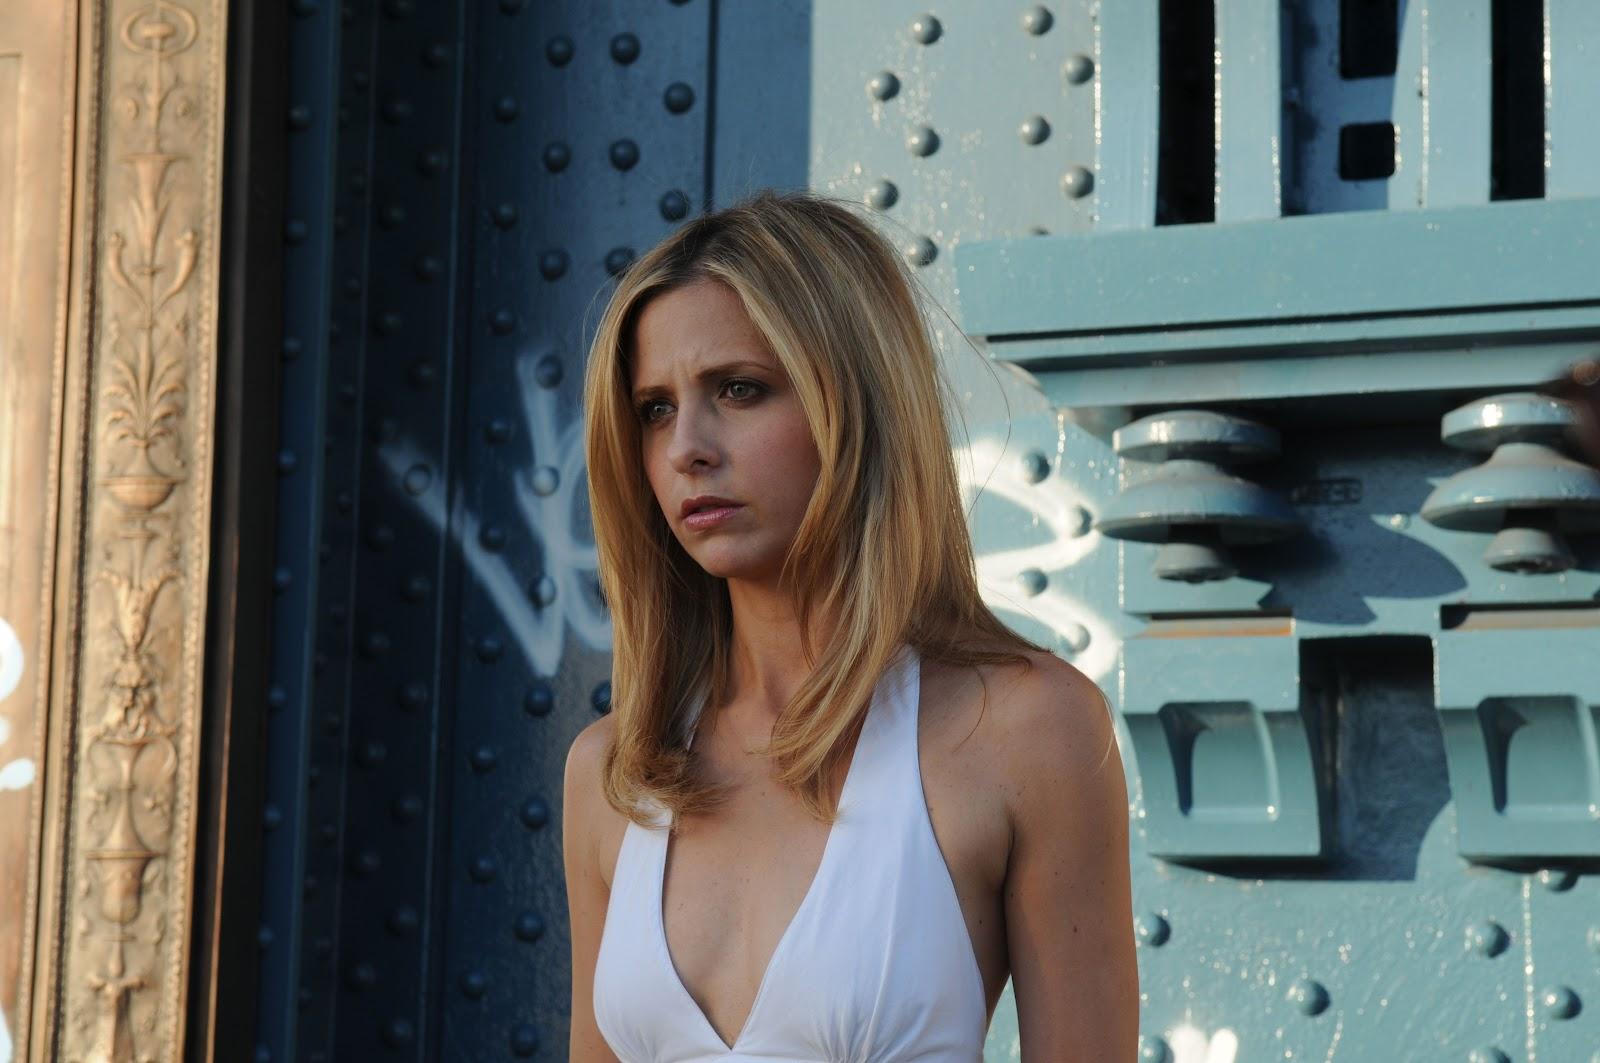 http://3.bp.blogspot.com/-APsn04IJL64/T0PV_2Dc8VI/AAAAAAAALgE/Ra1prfwfLL8/s1600/Veronika+Decides+to+Die+(1).jpg